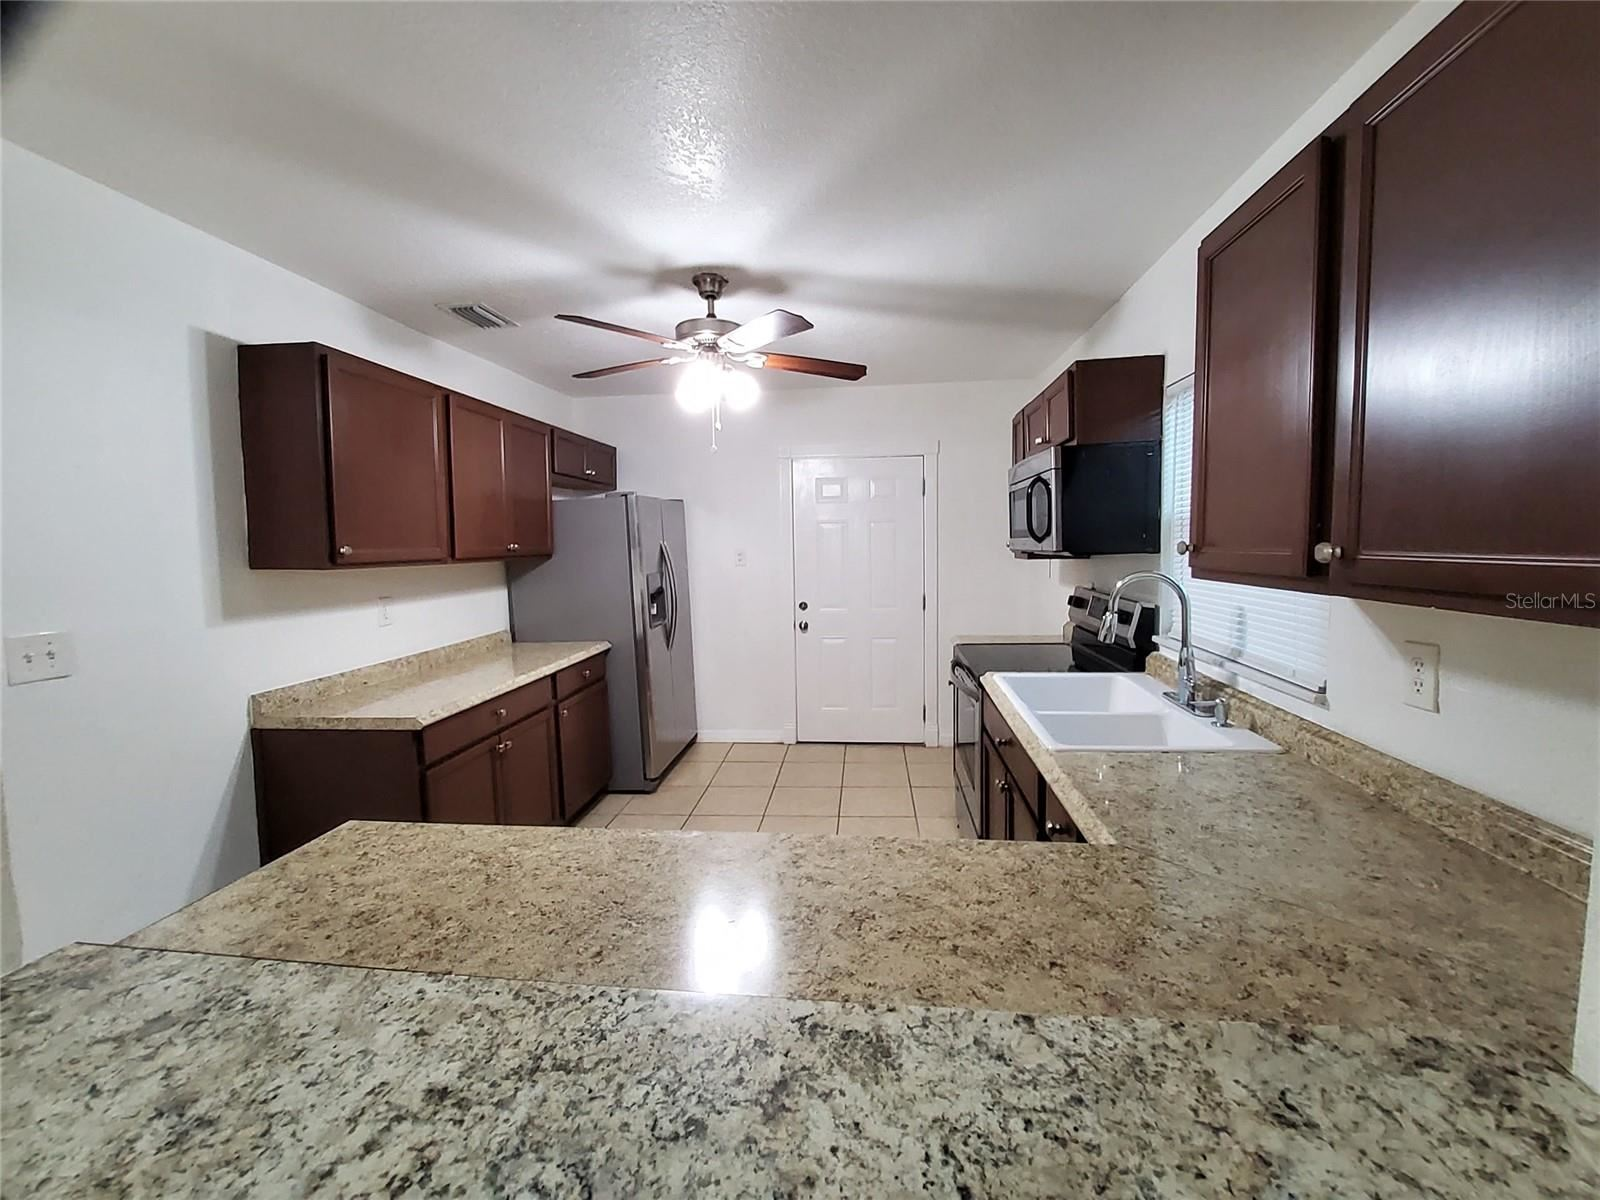 Photo of 808 27TH AVENUE W, BRADENTON, FL 34205 (MLS # A4515845)